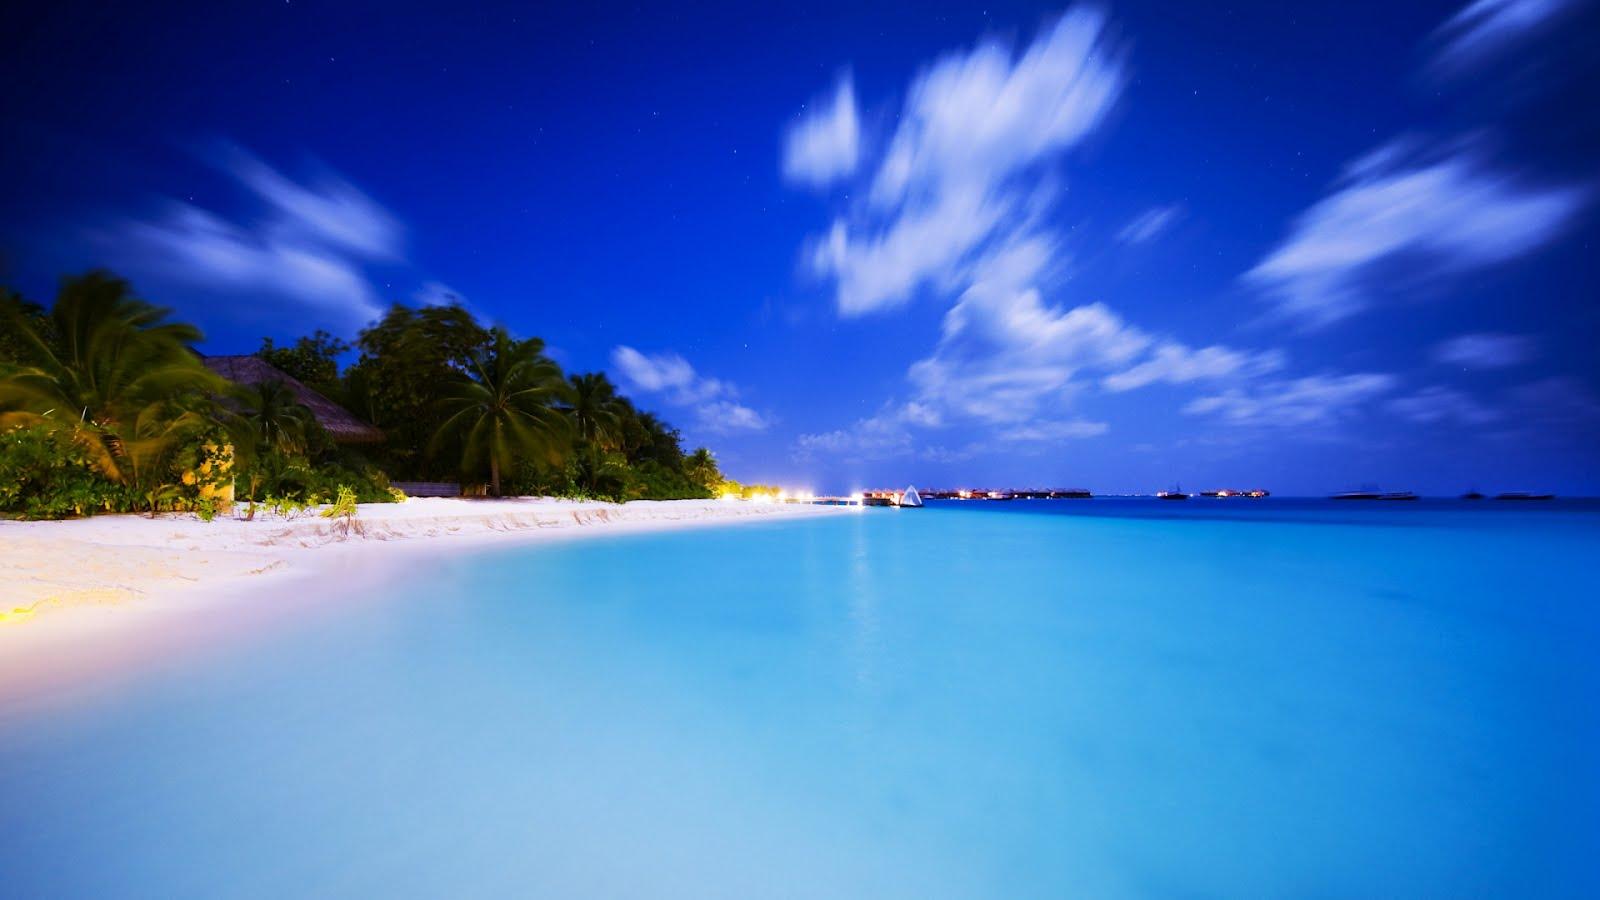 Maldives at night download HD wallpapers for desktop 1600x900